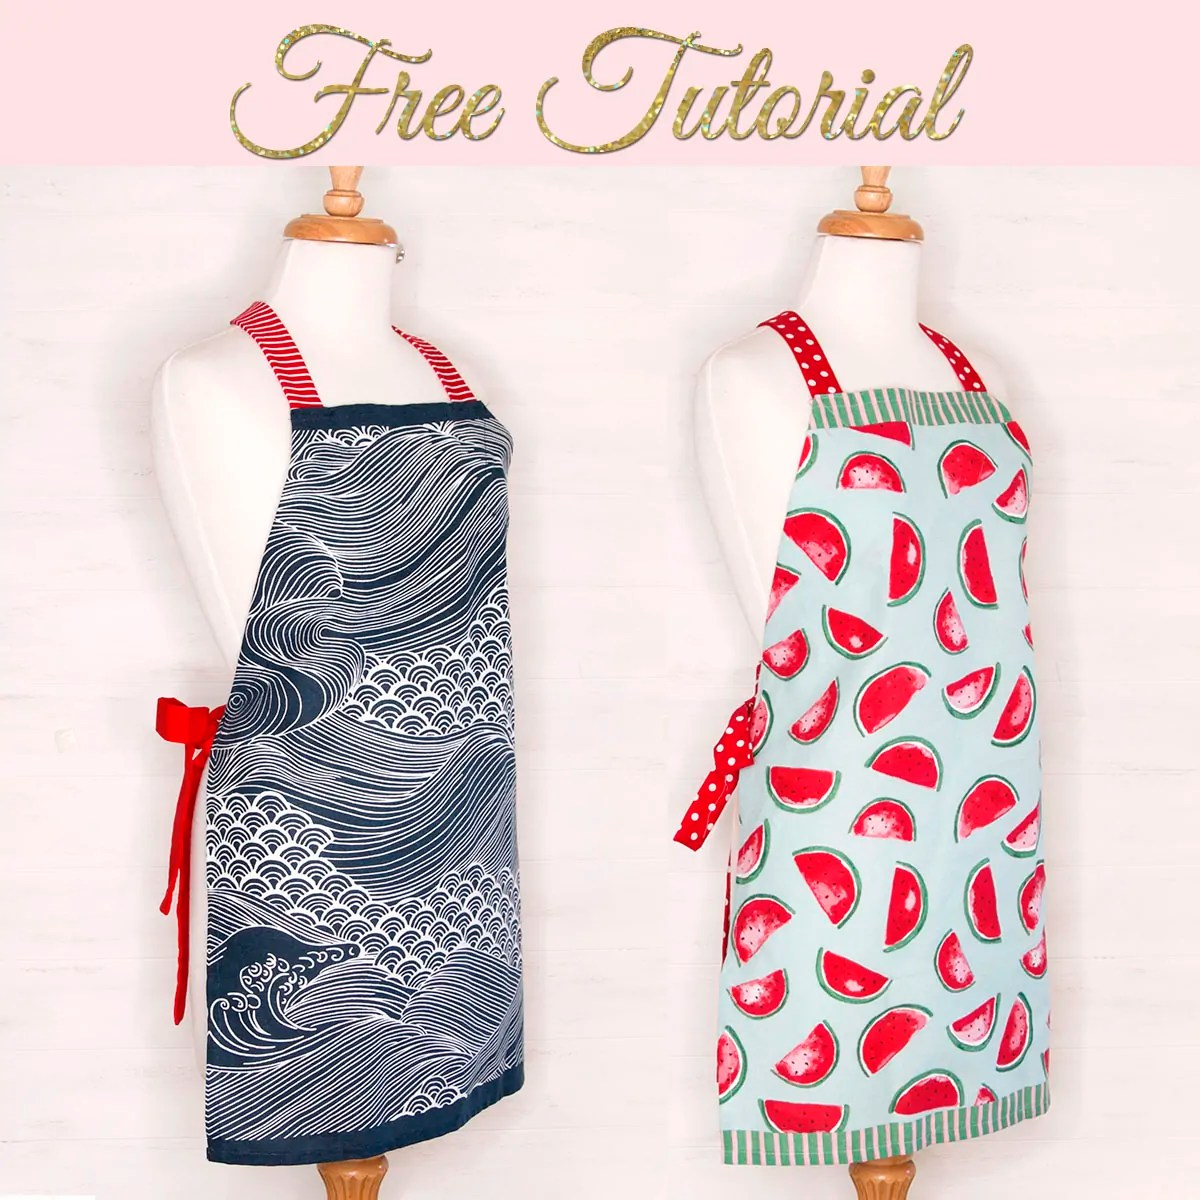 image relating to Free Printable Apron Patterns known as Tea Towel Apron Manual: Straightforward and Basic TREASURIE